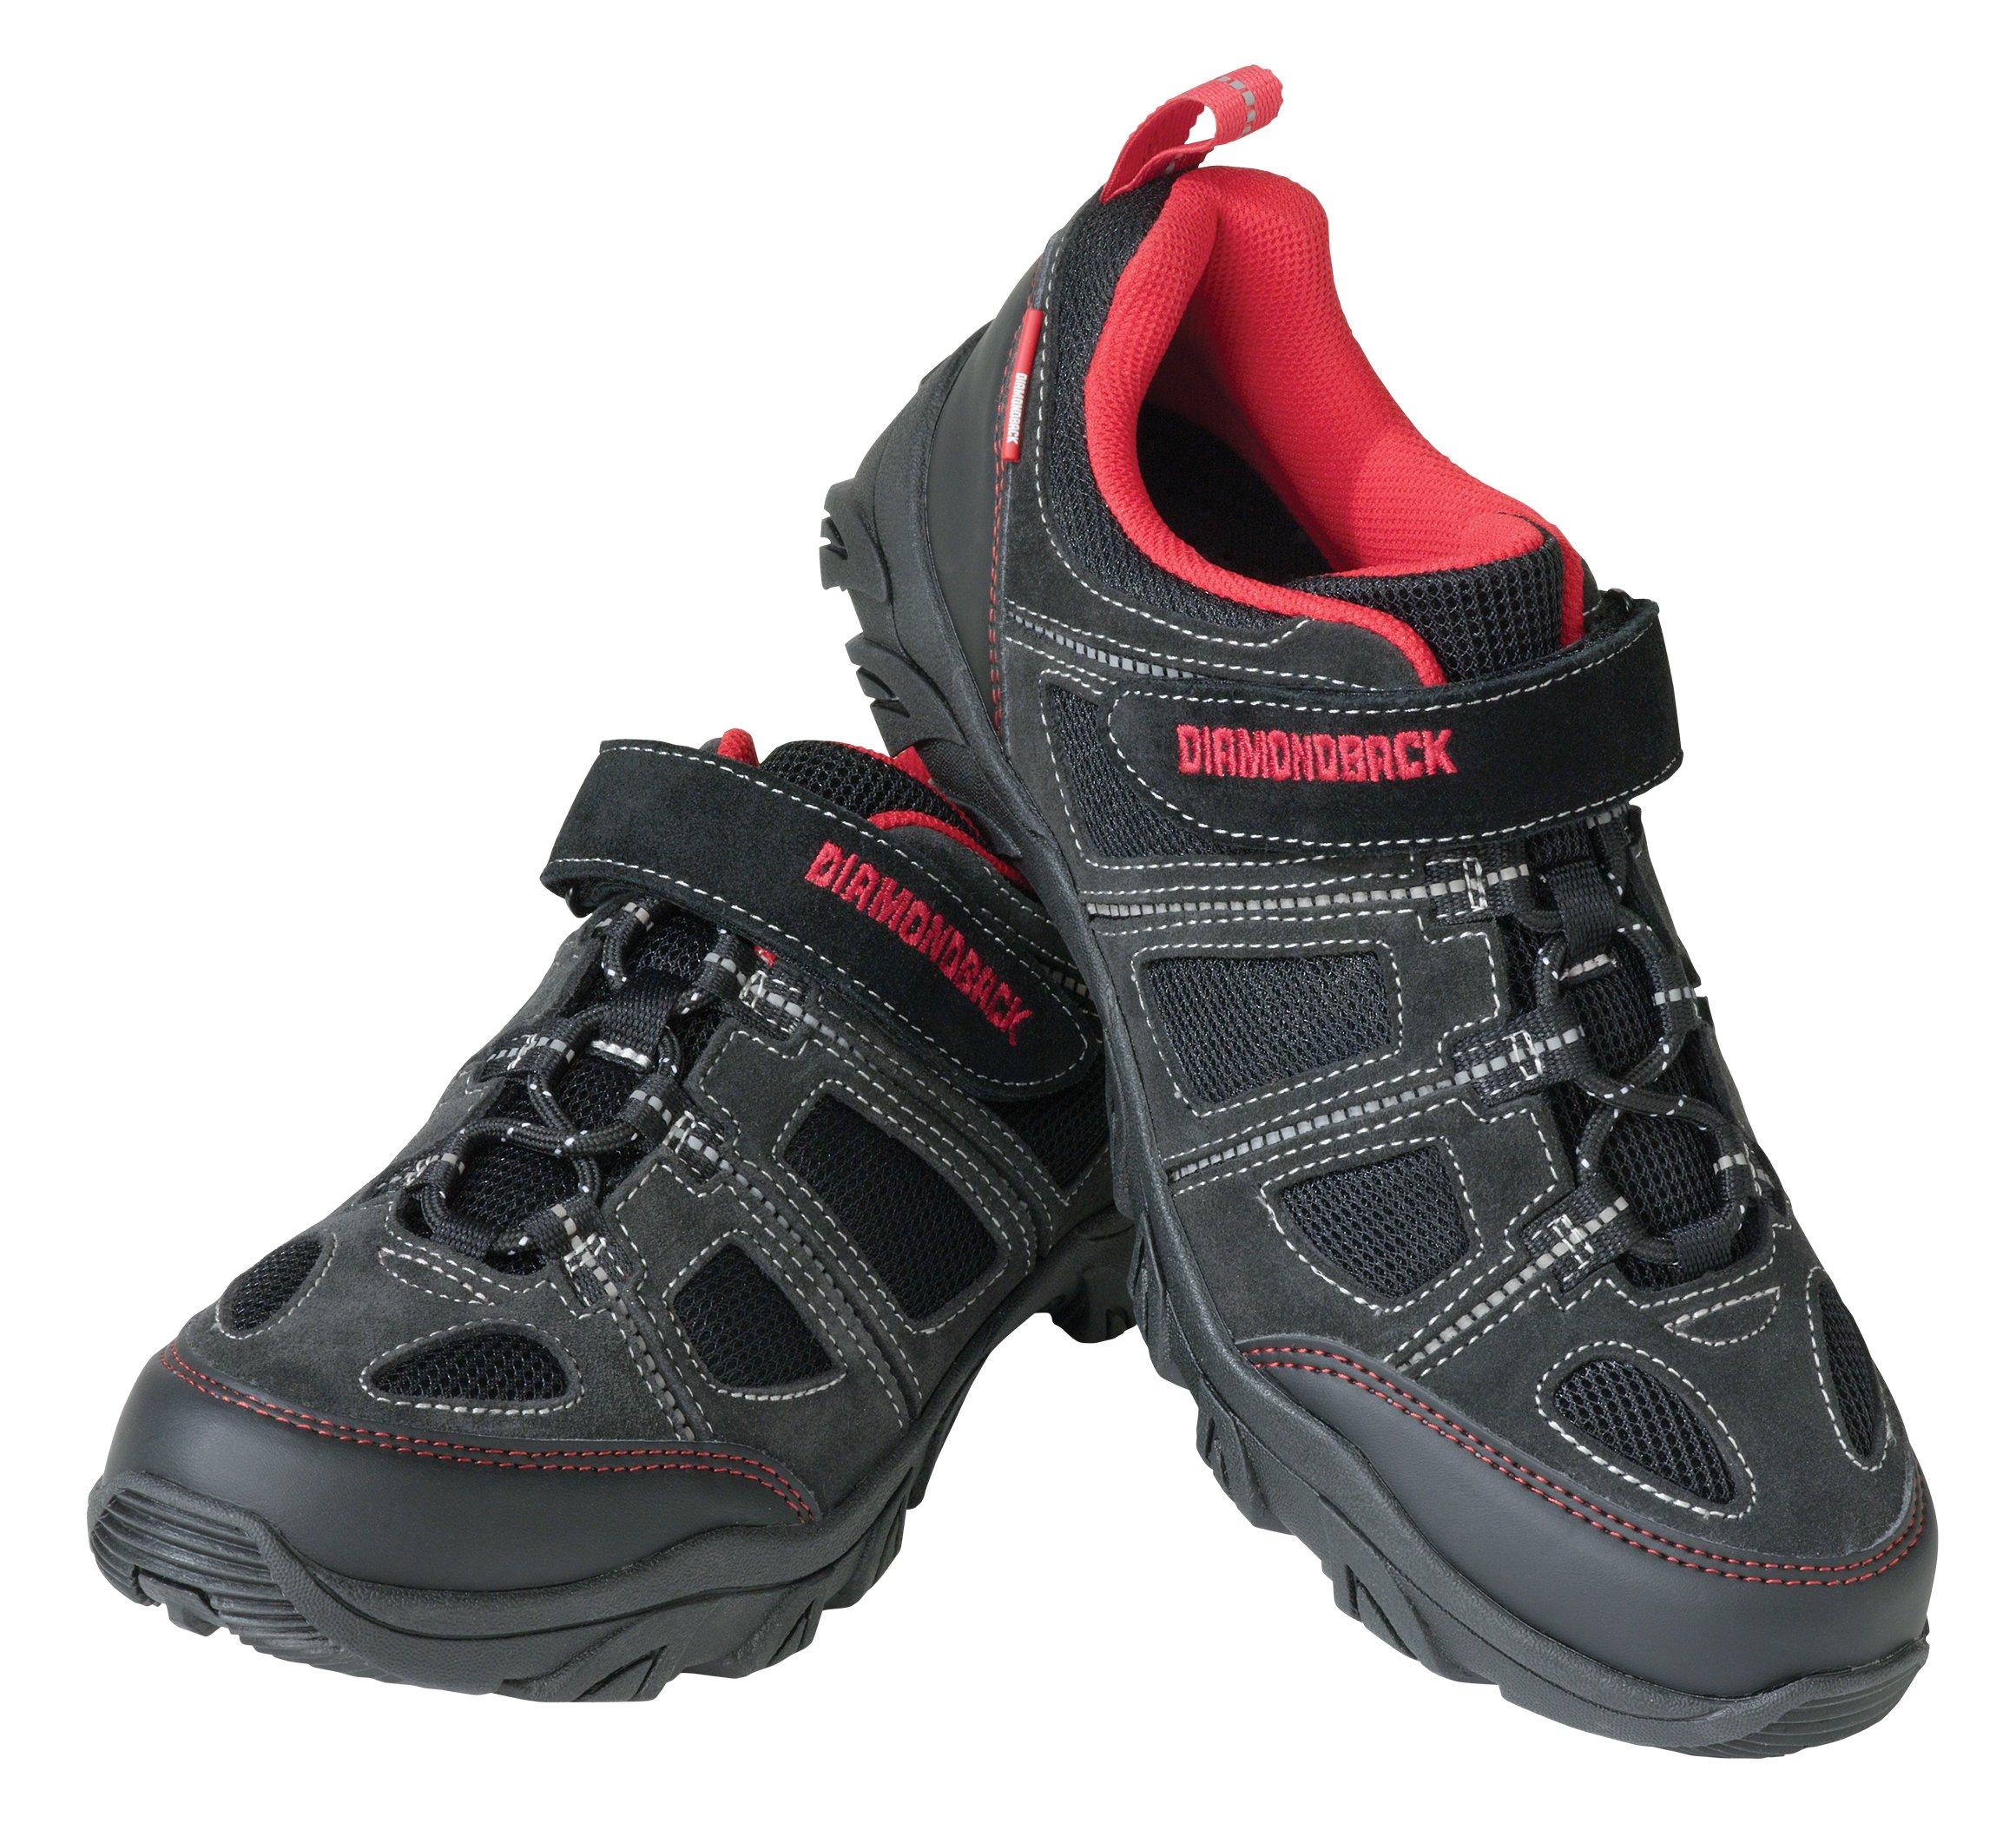 Diamondback Men's Trace Clipless Pedal Compatible Cycling Shoe, Size 45 EU/11-11.5 US by Diamondback